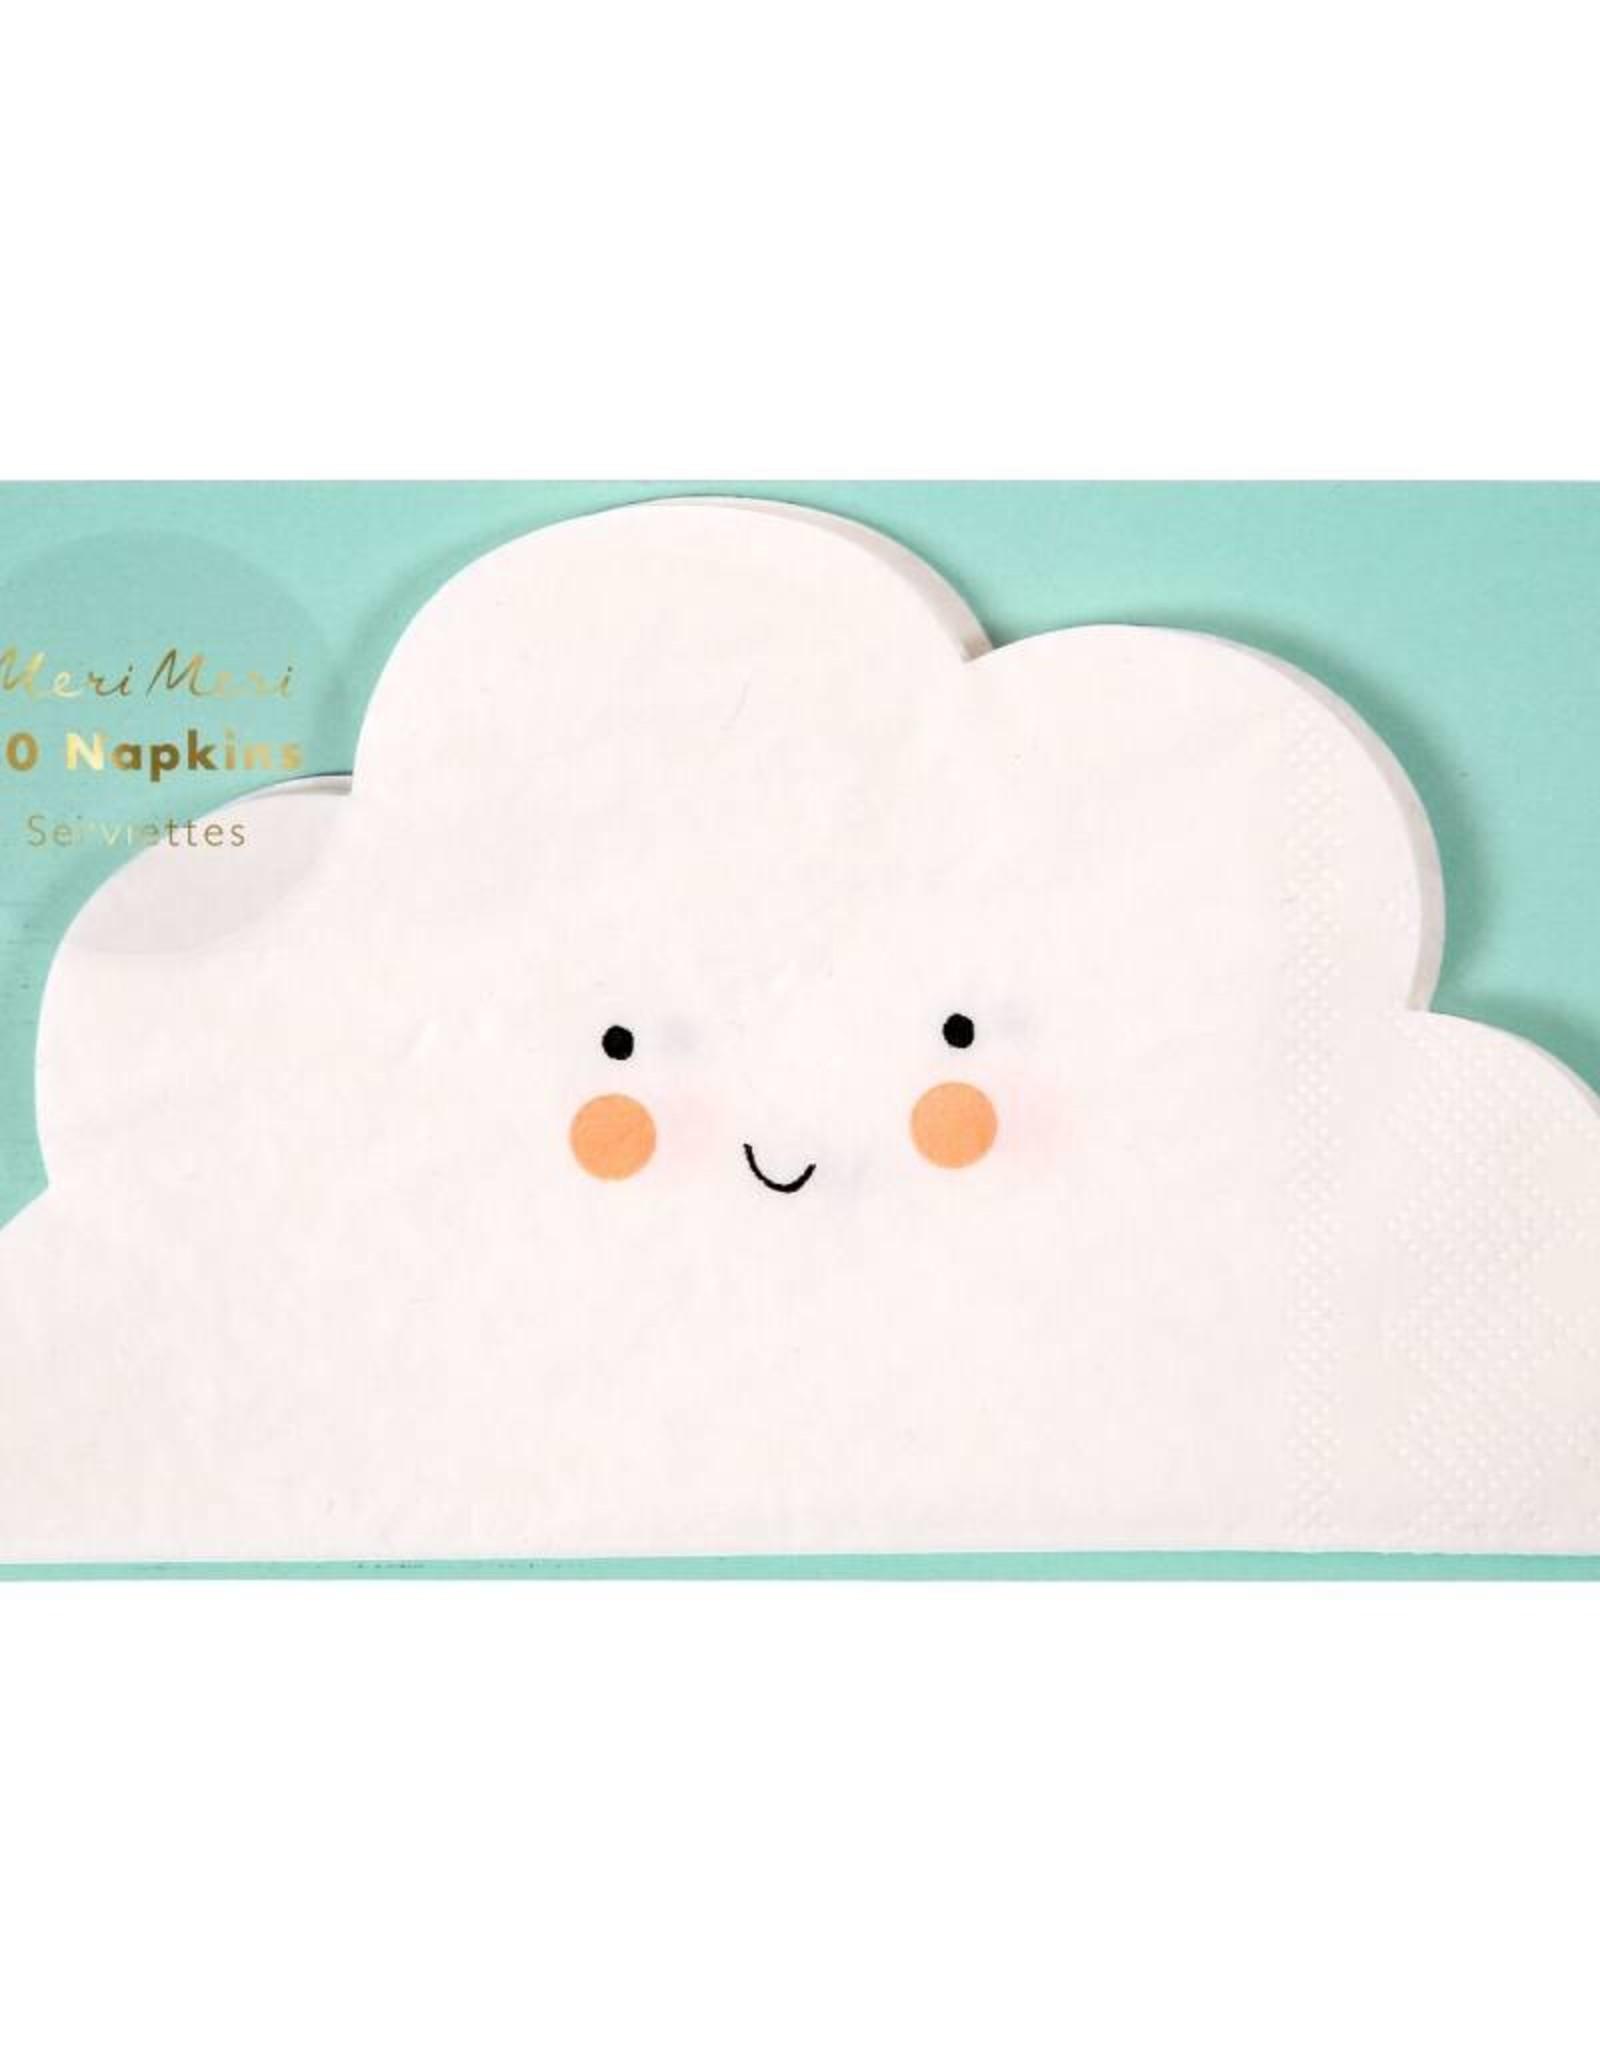 Meri Meri cloud cutout napkins